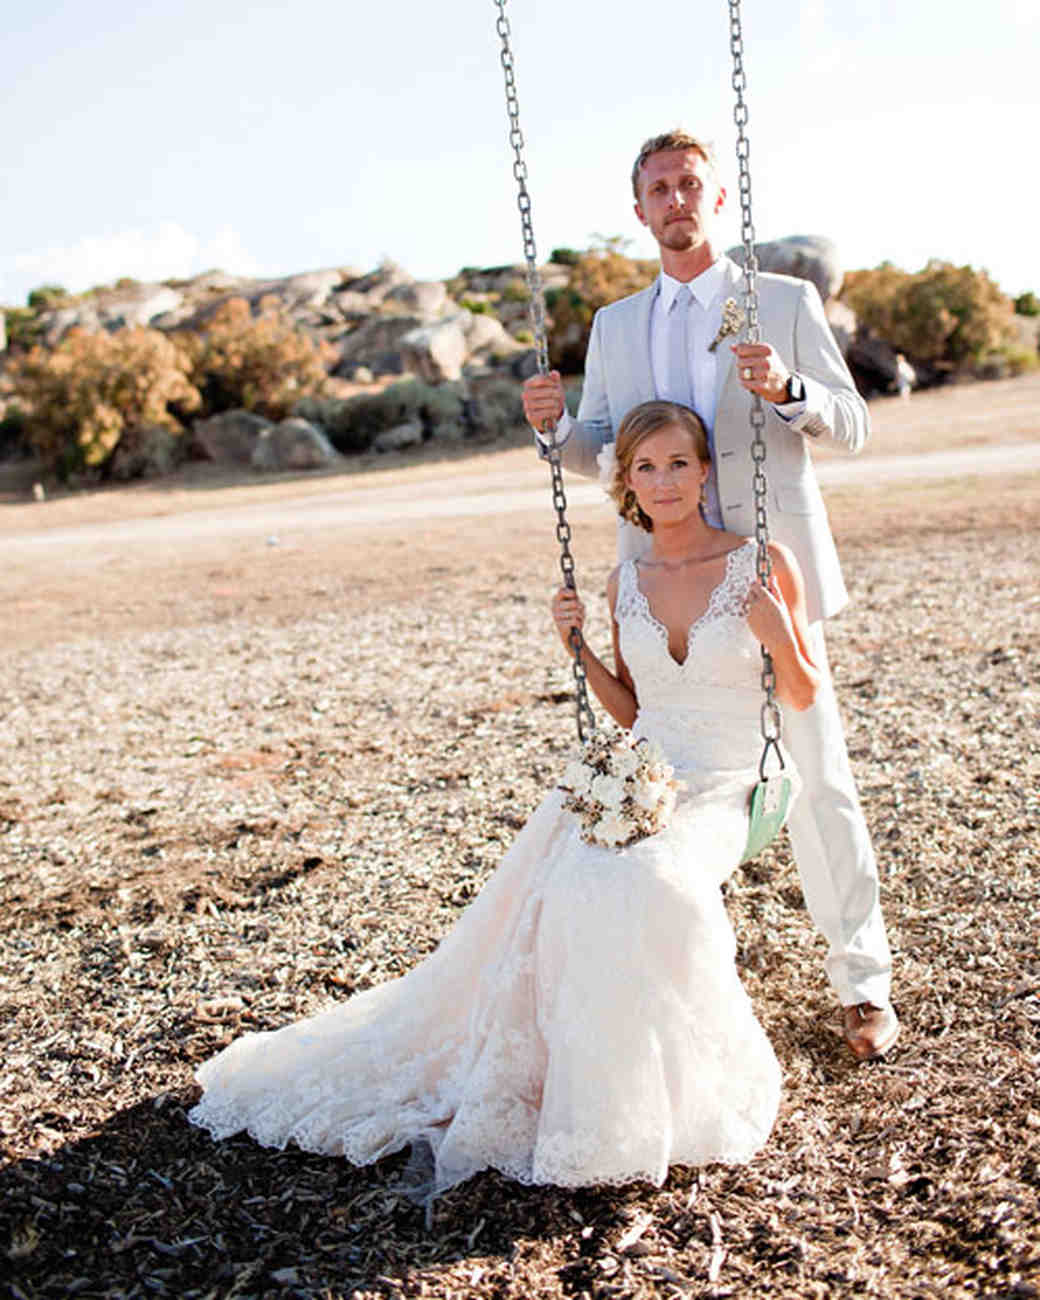 A Rustic Neutral-Palette Outdoor Destination Wedding in California ...